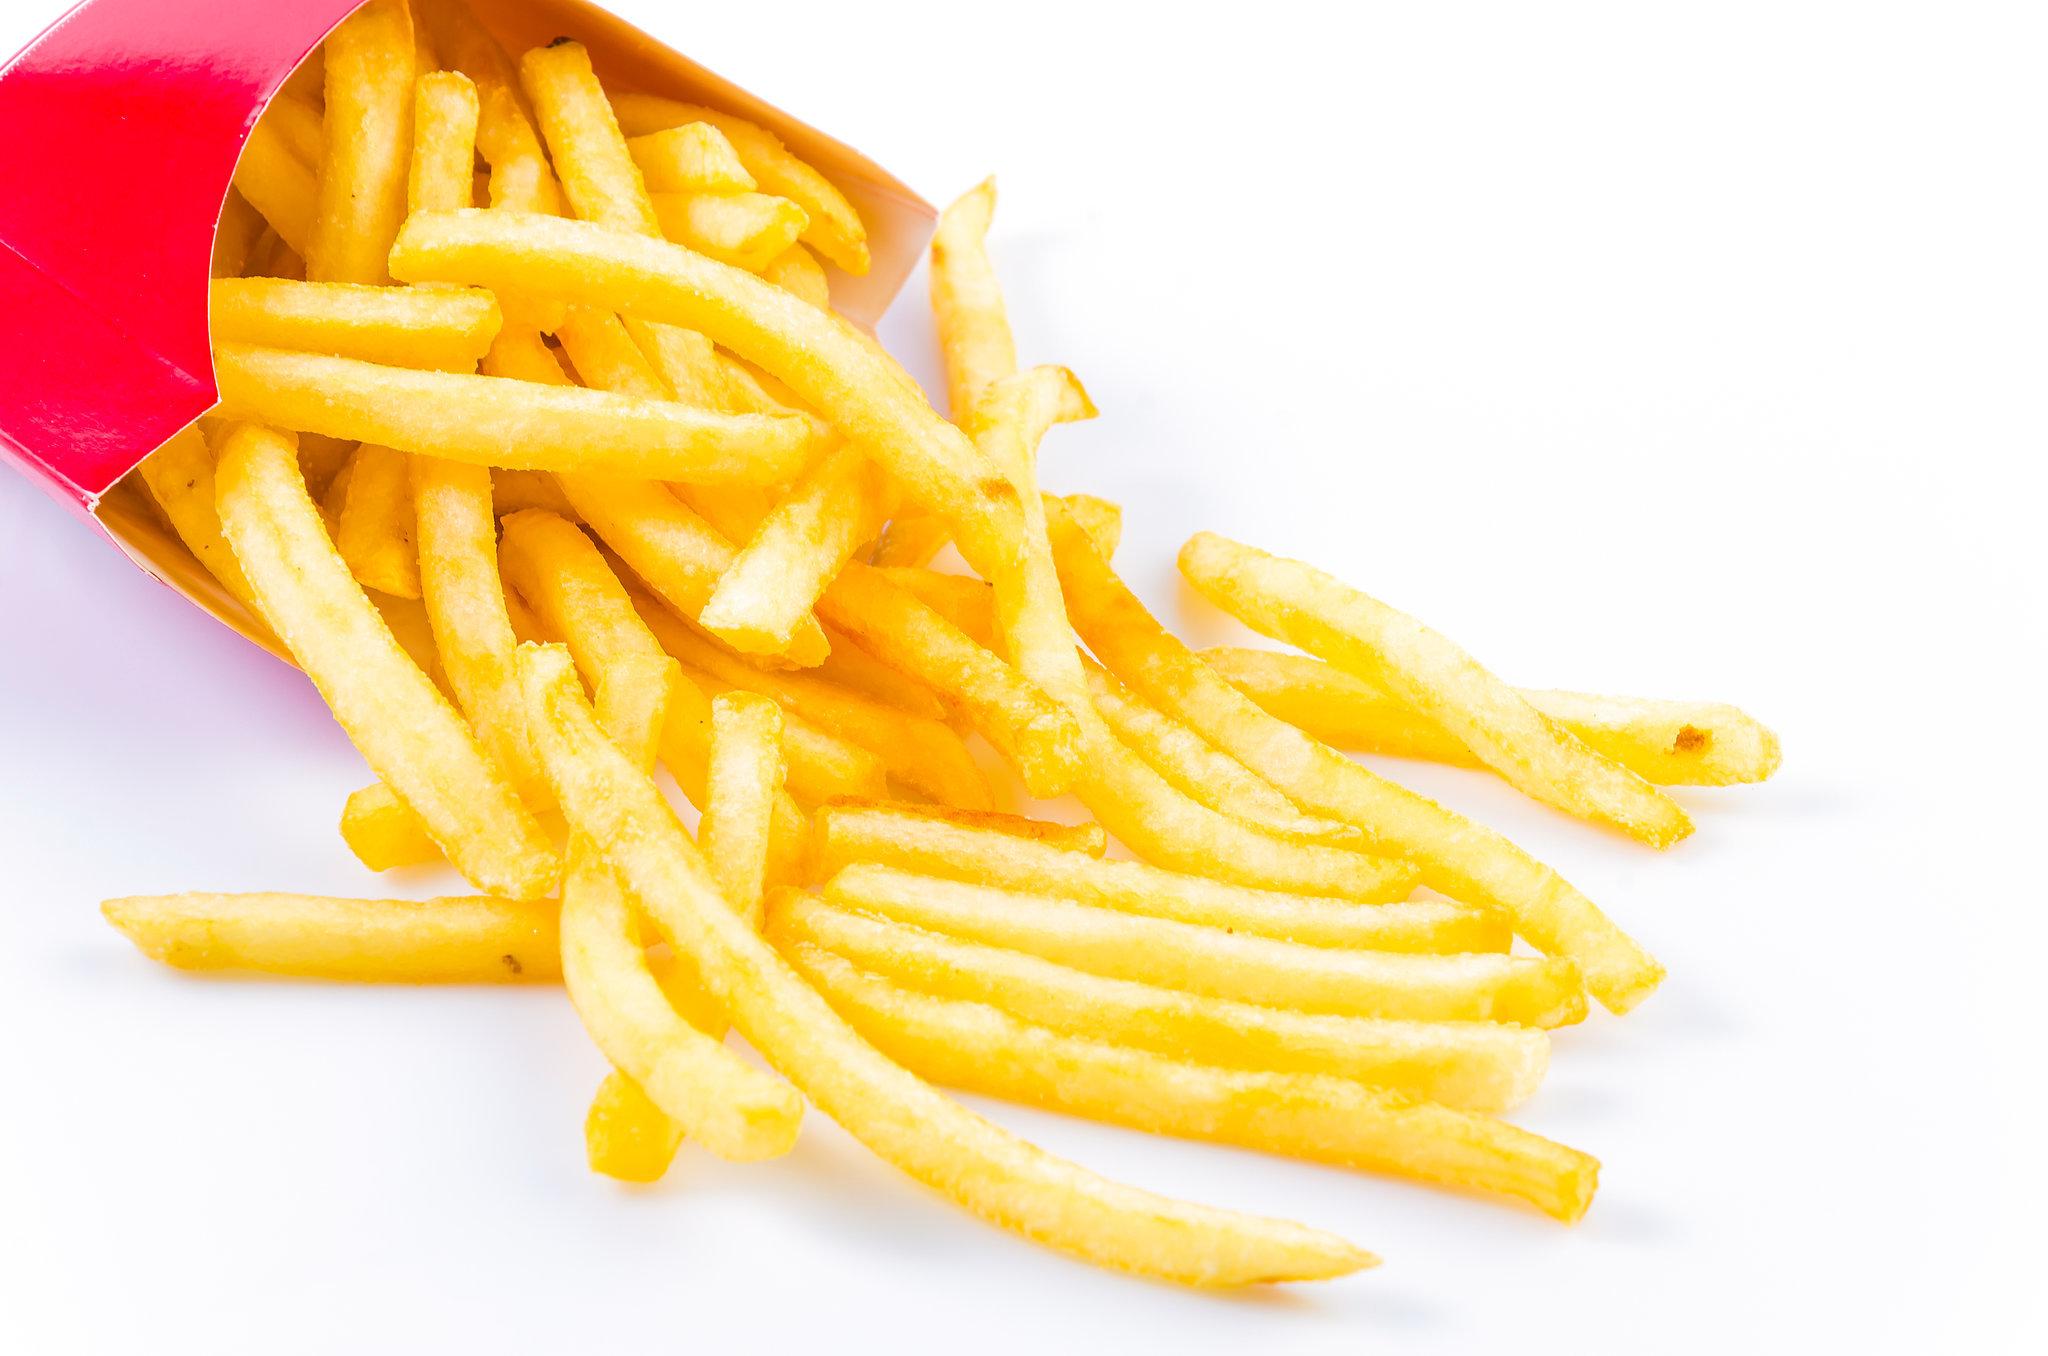 Fast Food French Fries Taste Test | POPSUGAR Food